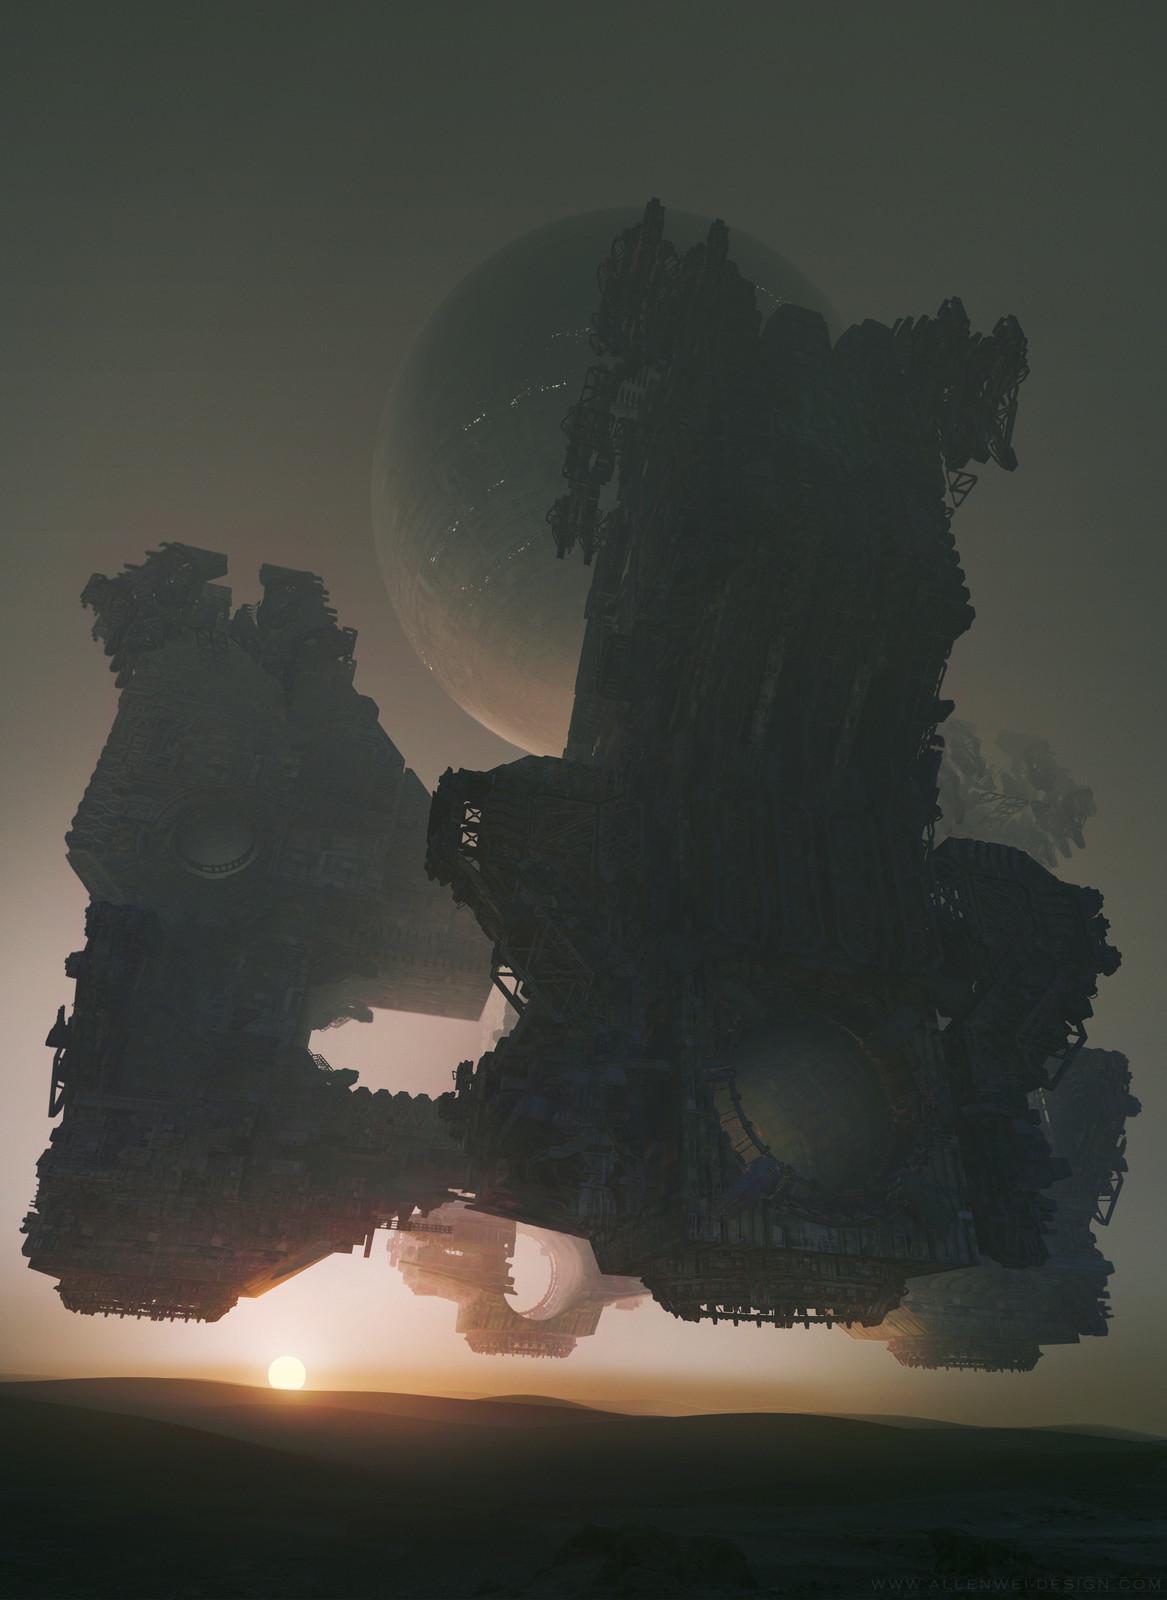 look at the sun on Mars base 017